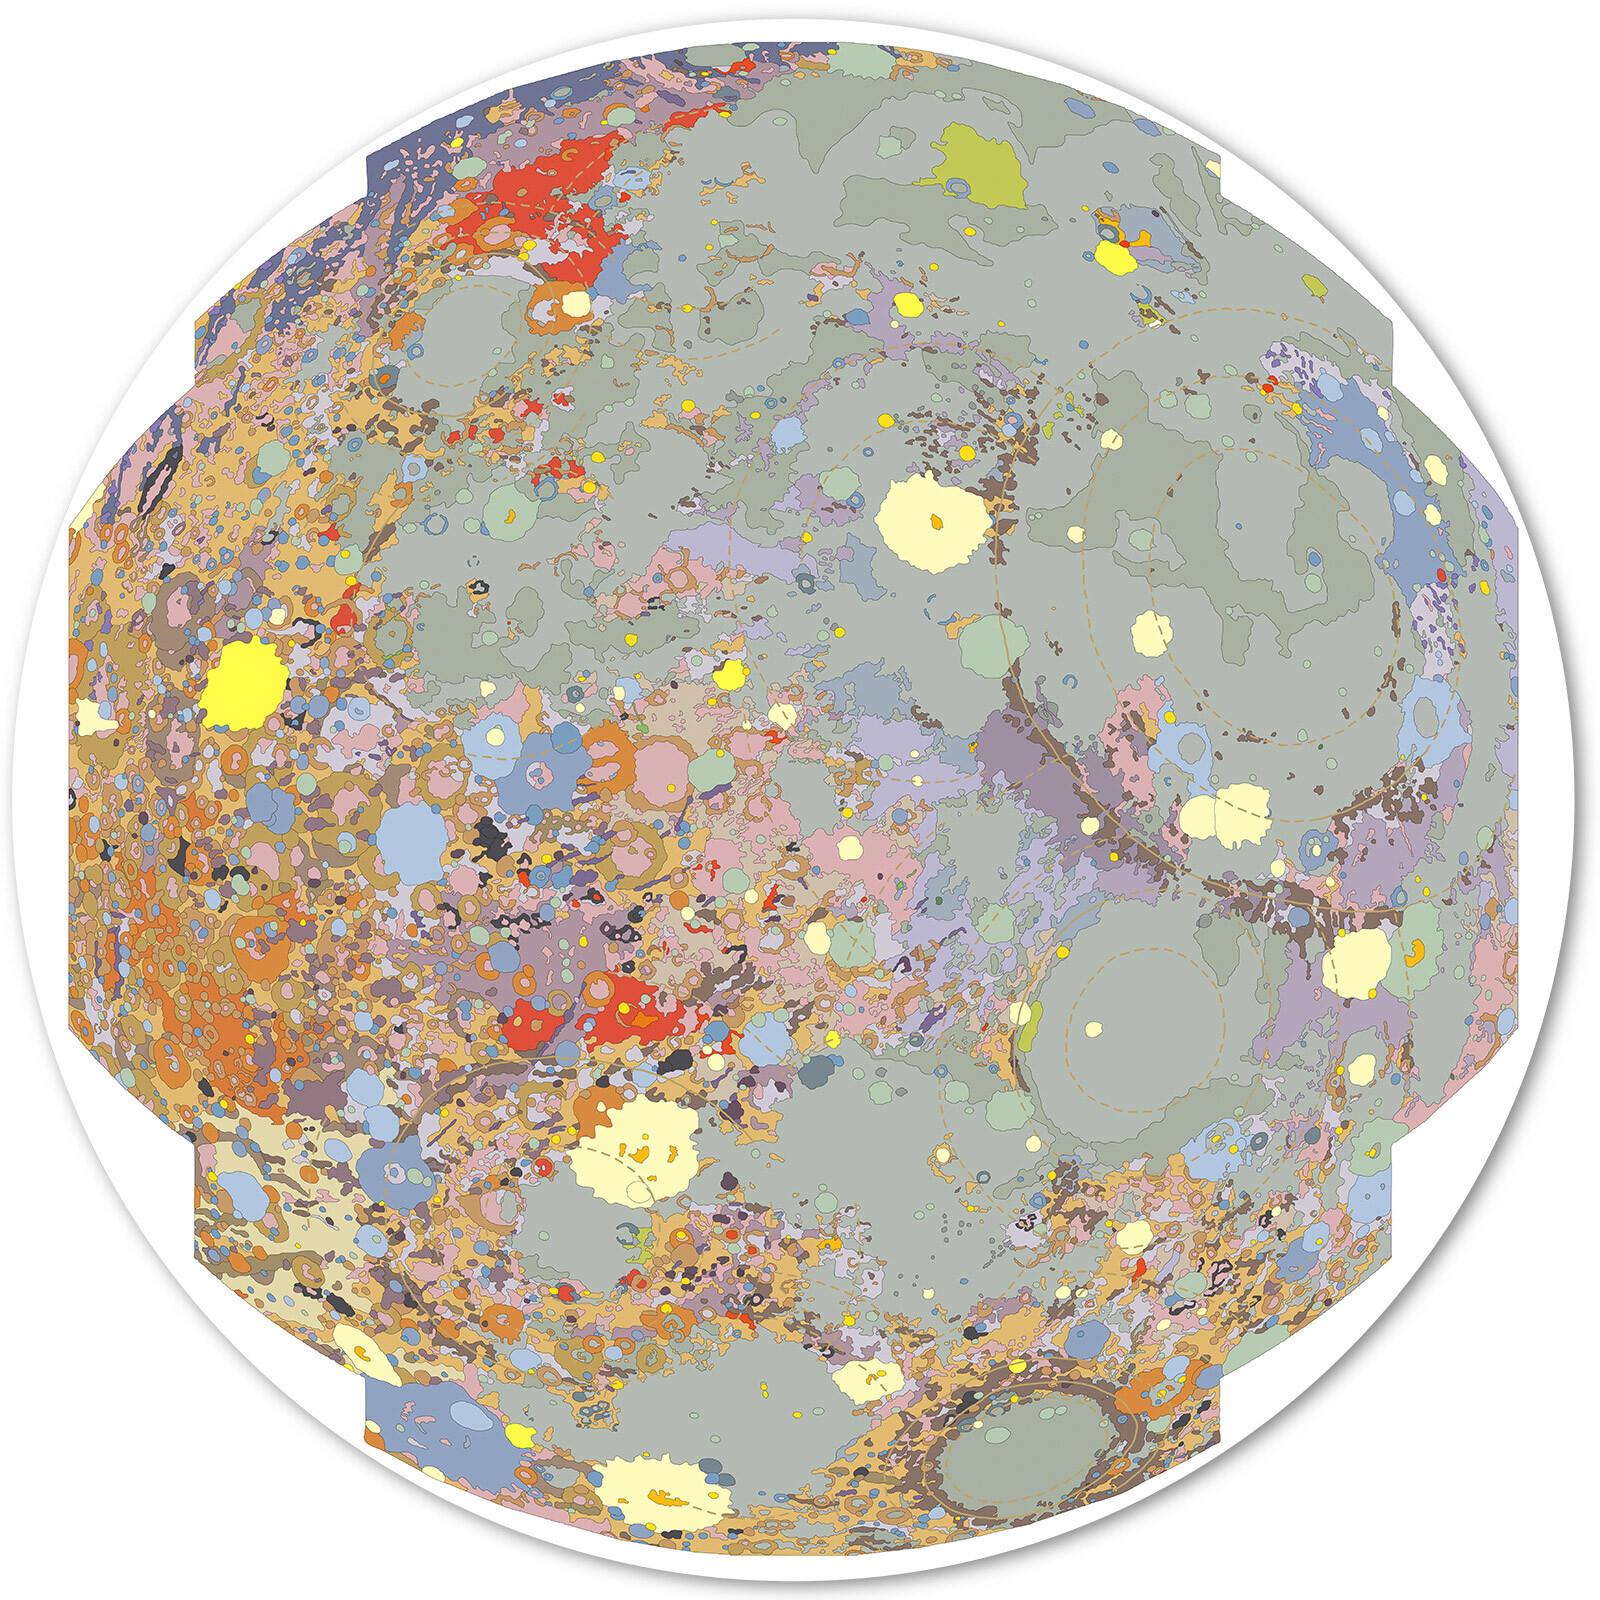 Moon, near side (USGS/Rich Kozak) - Astrogeology